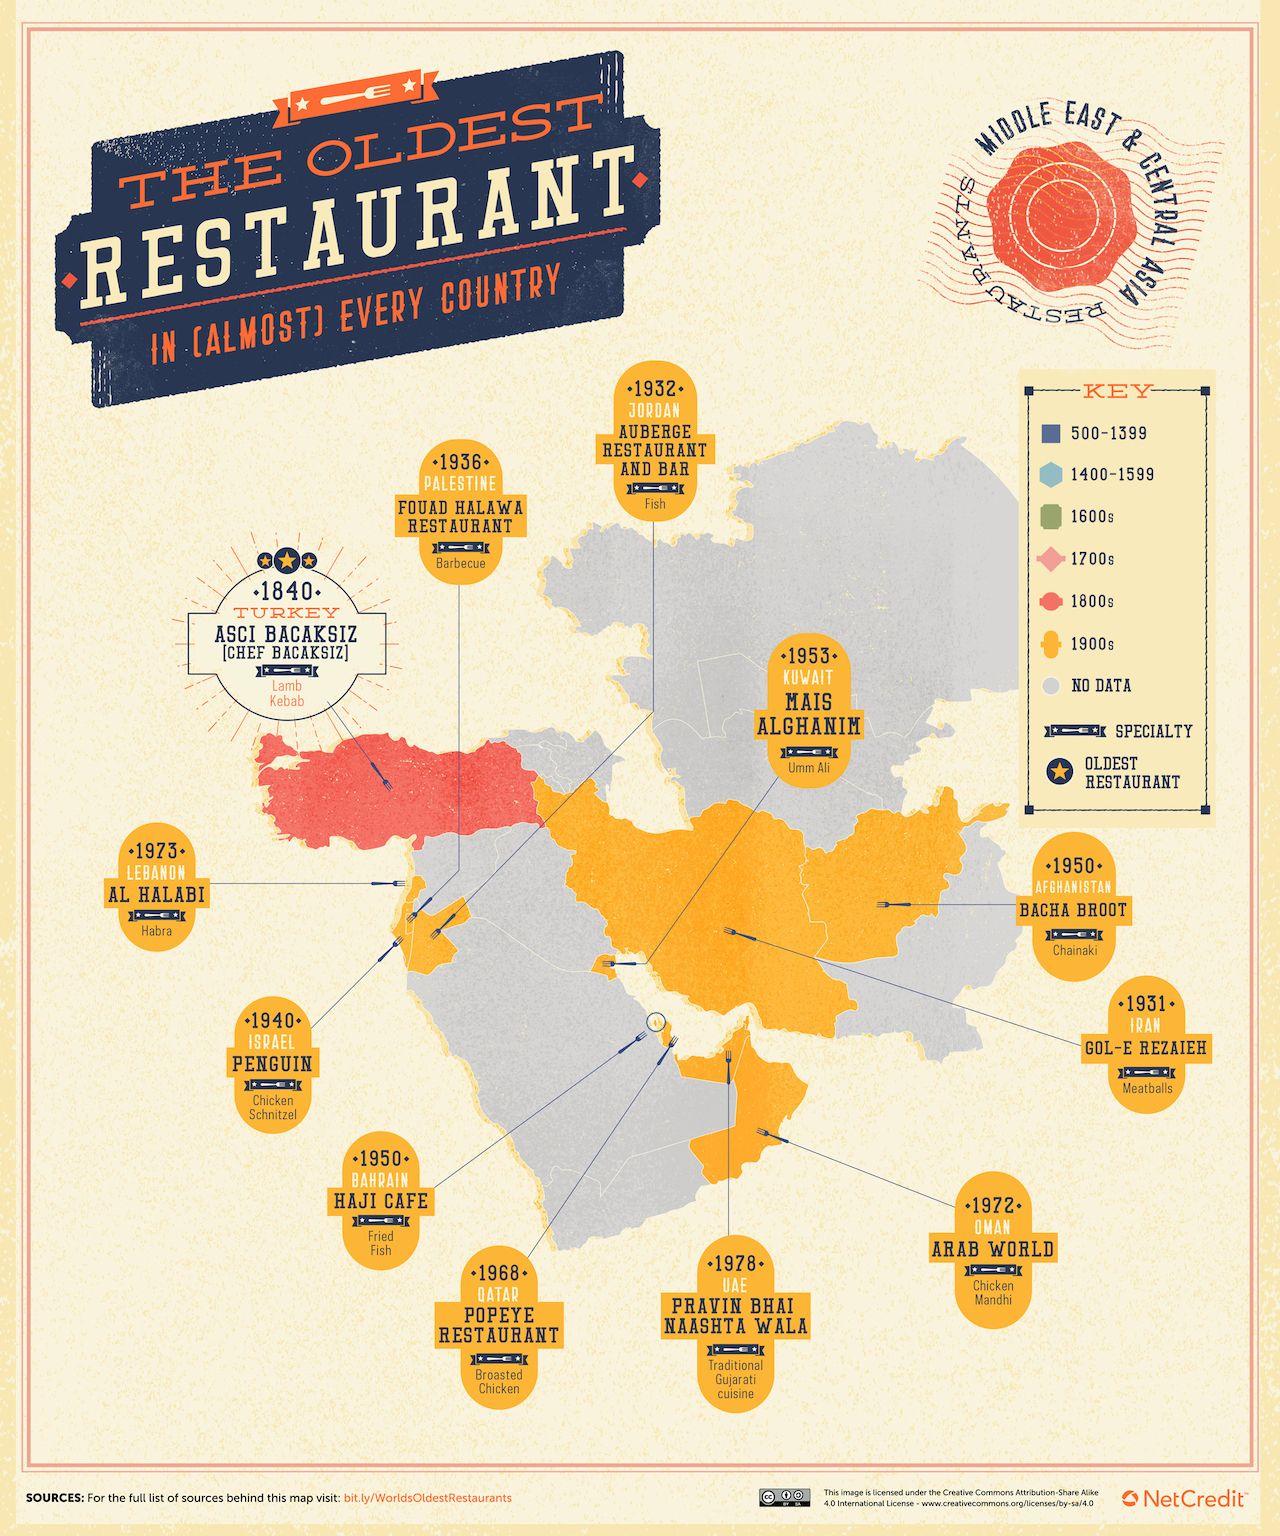 oldest-restaurant-middle-east-central-asia